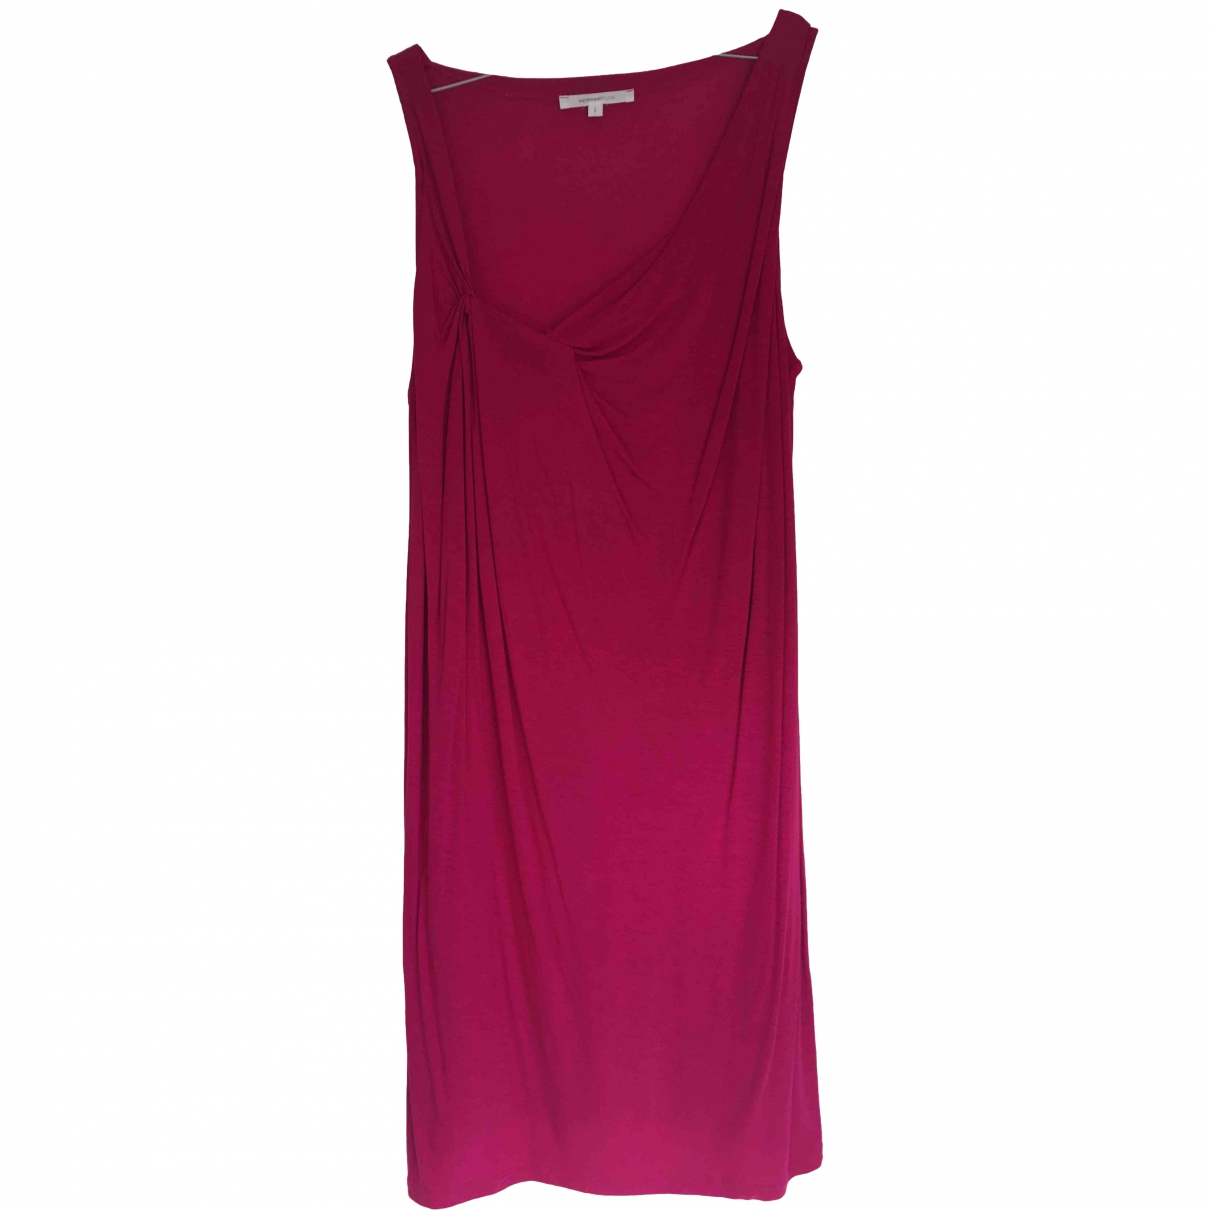 Vanessa Bruno \N Pink dress for Women 1 0-5